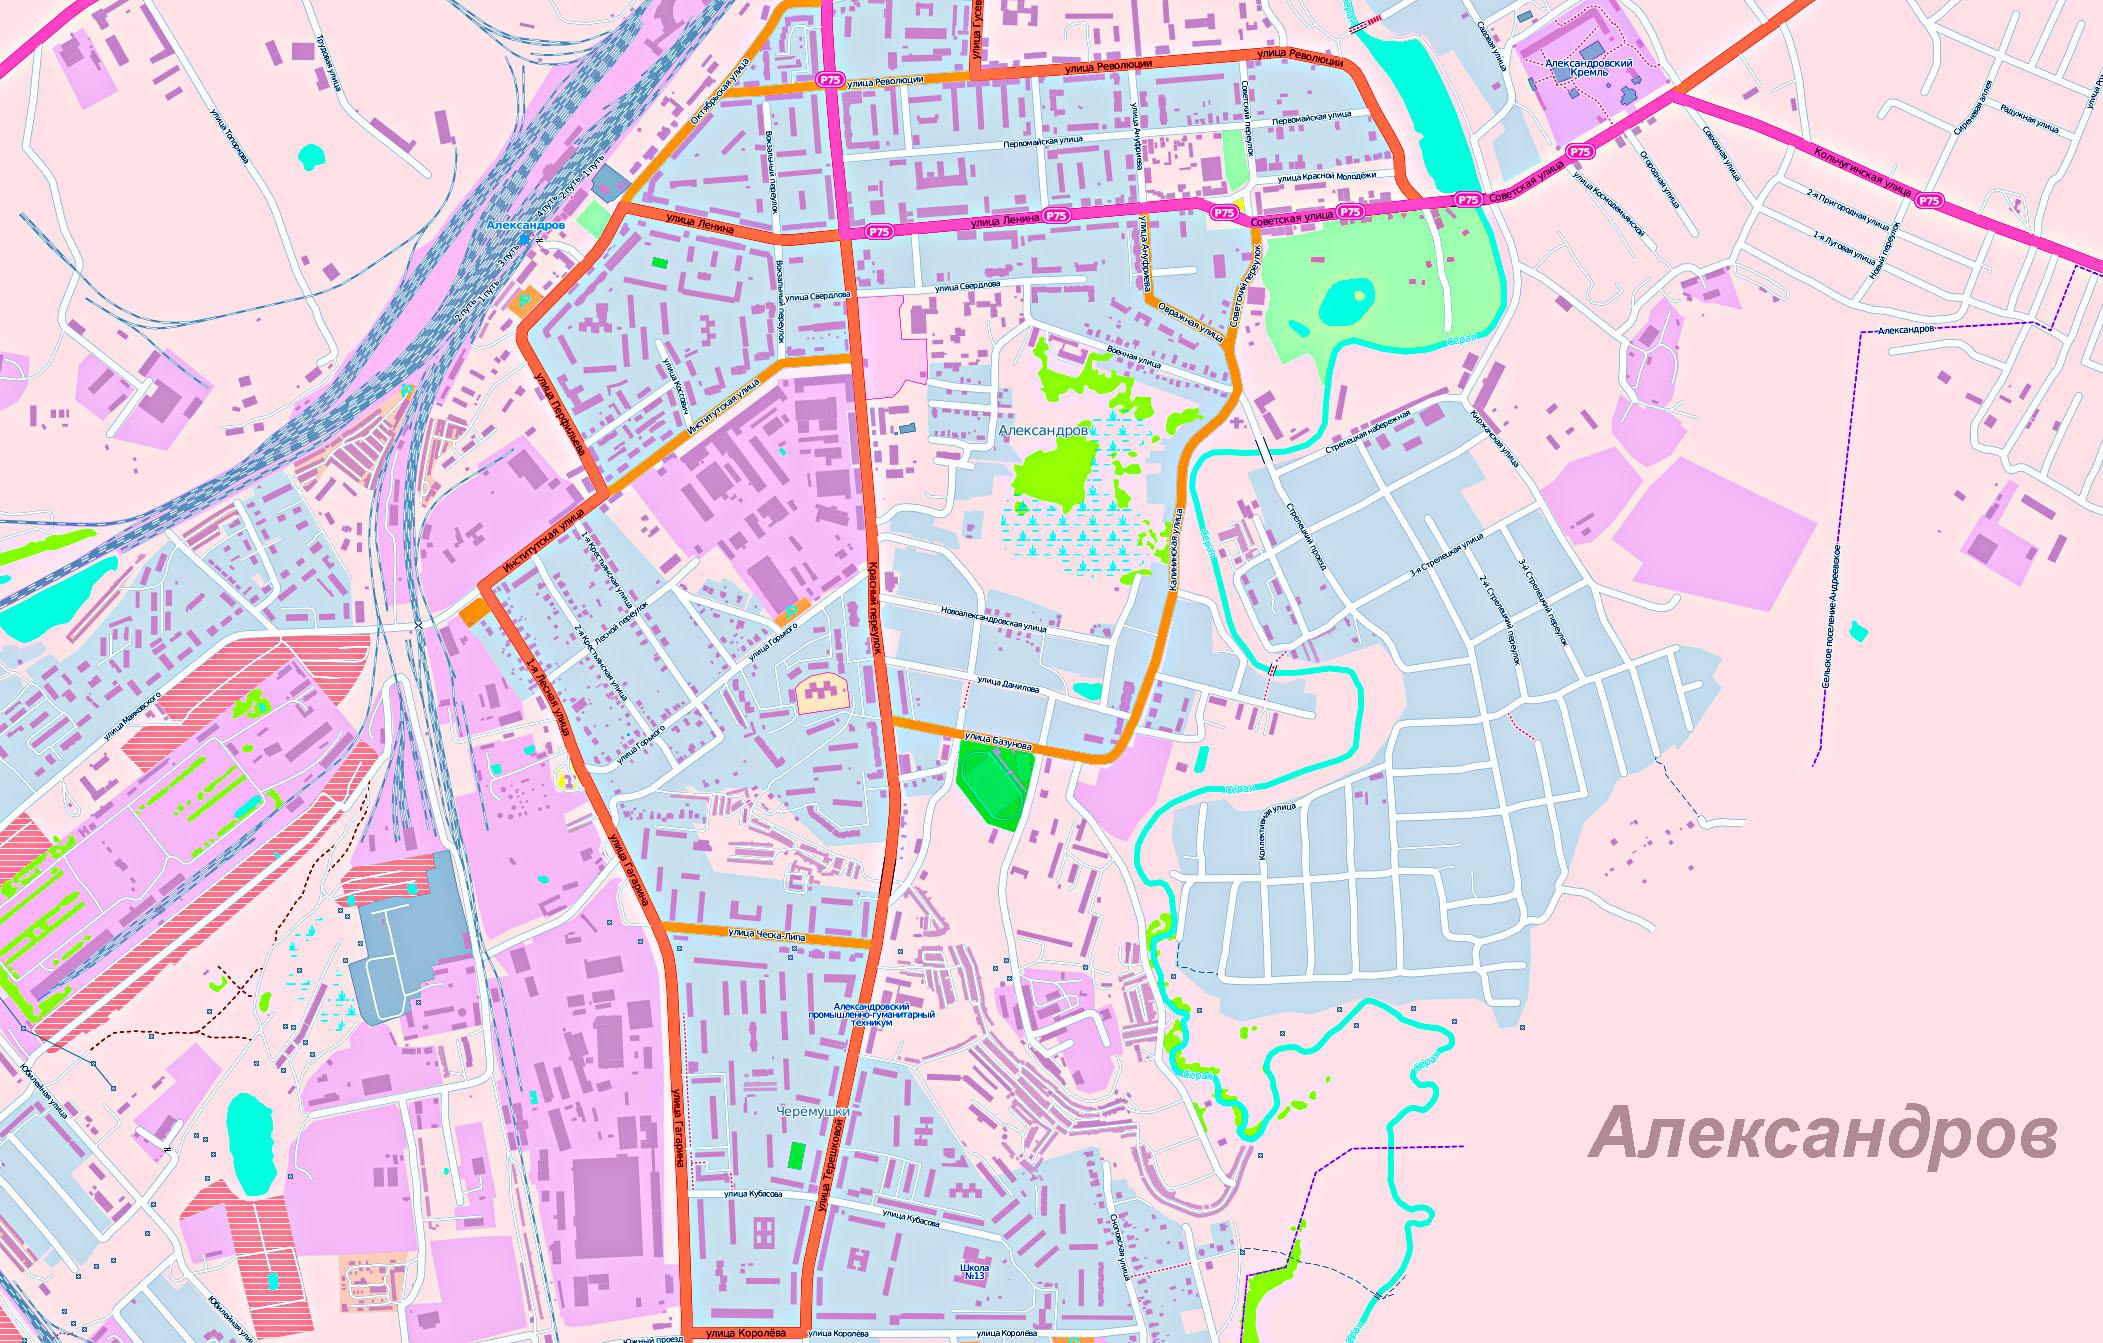 Александров схема улиц